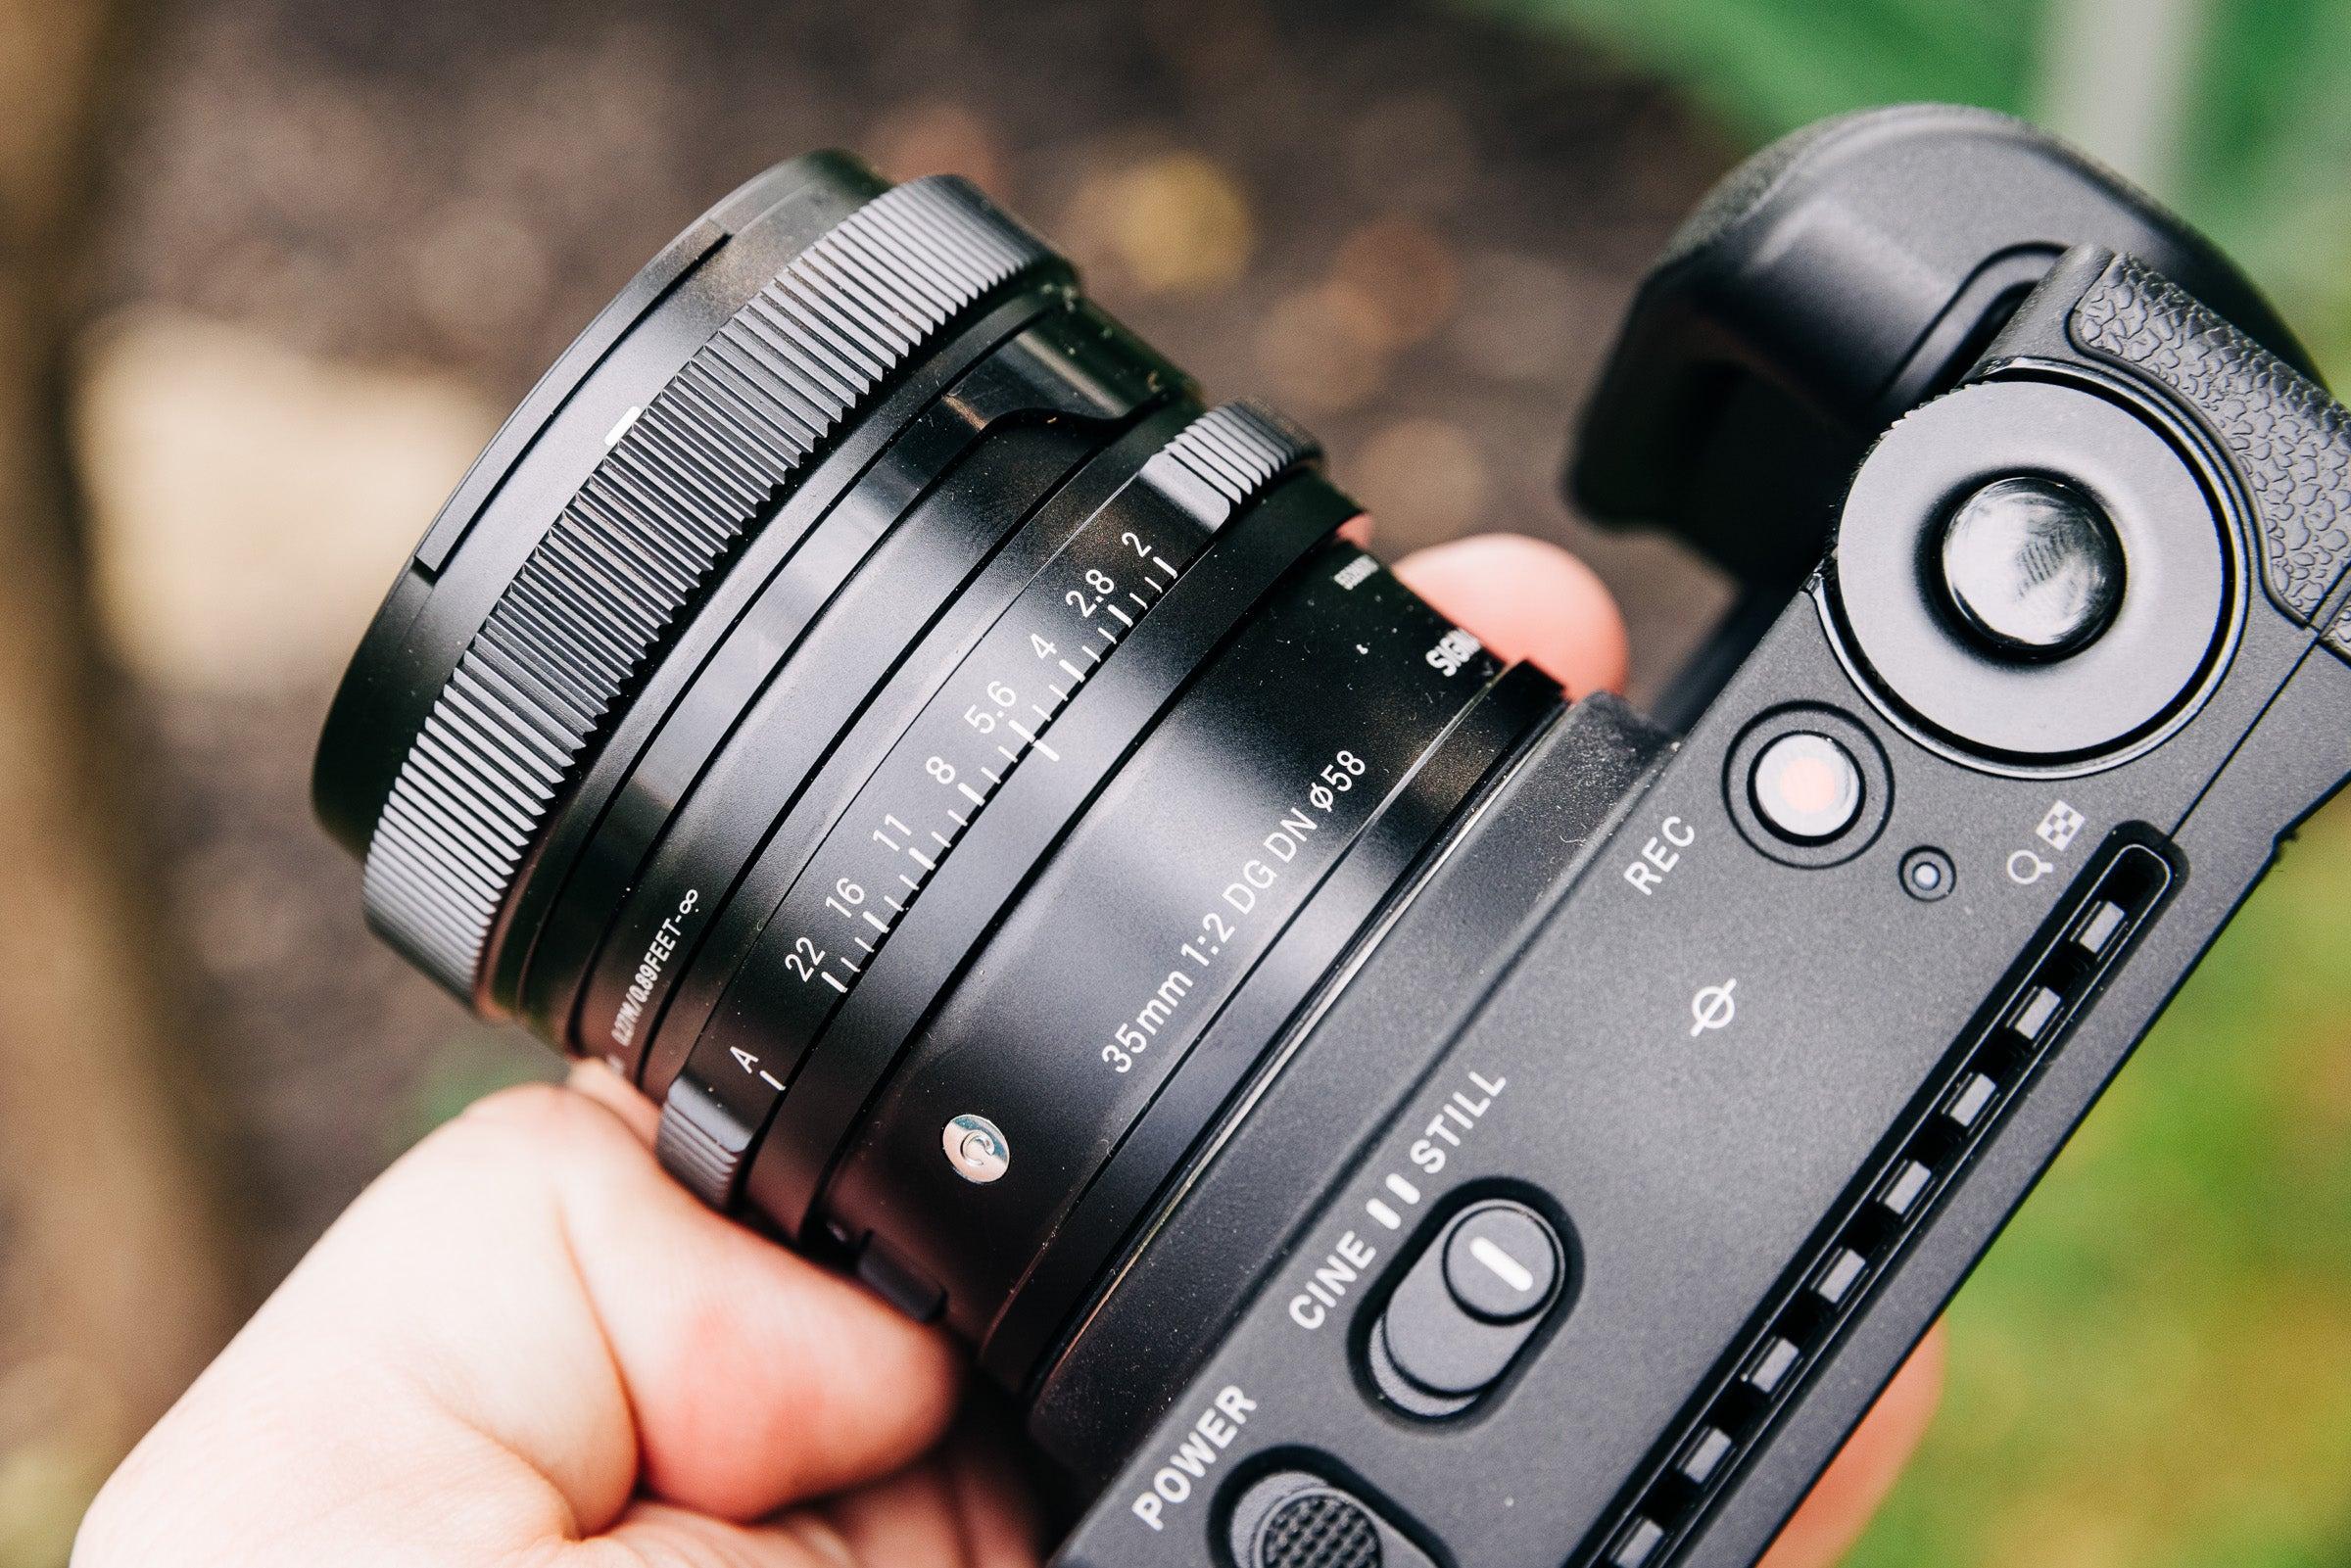 Sigma 35mm fSigma 35mm f/2 lens review /2 lens review